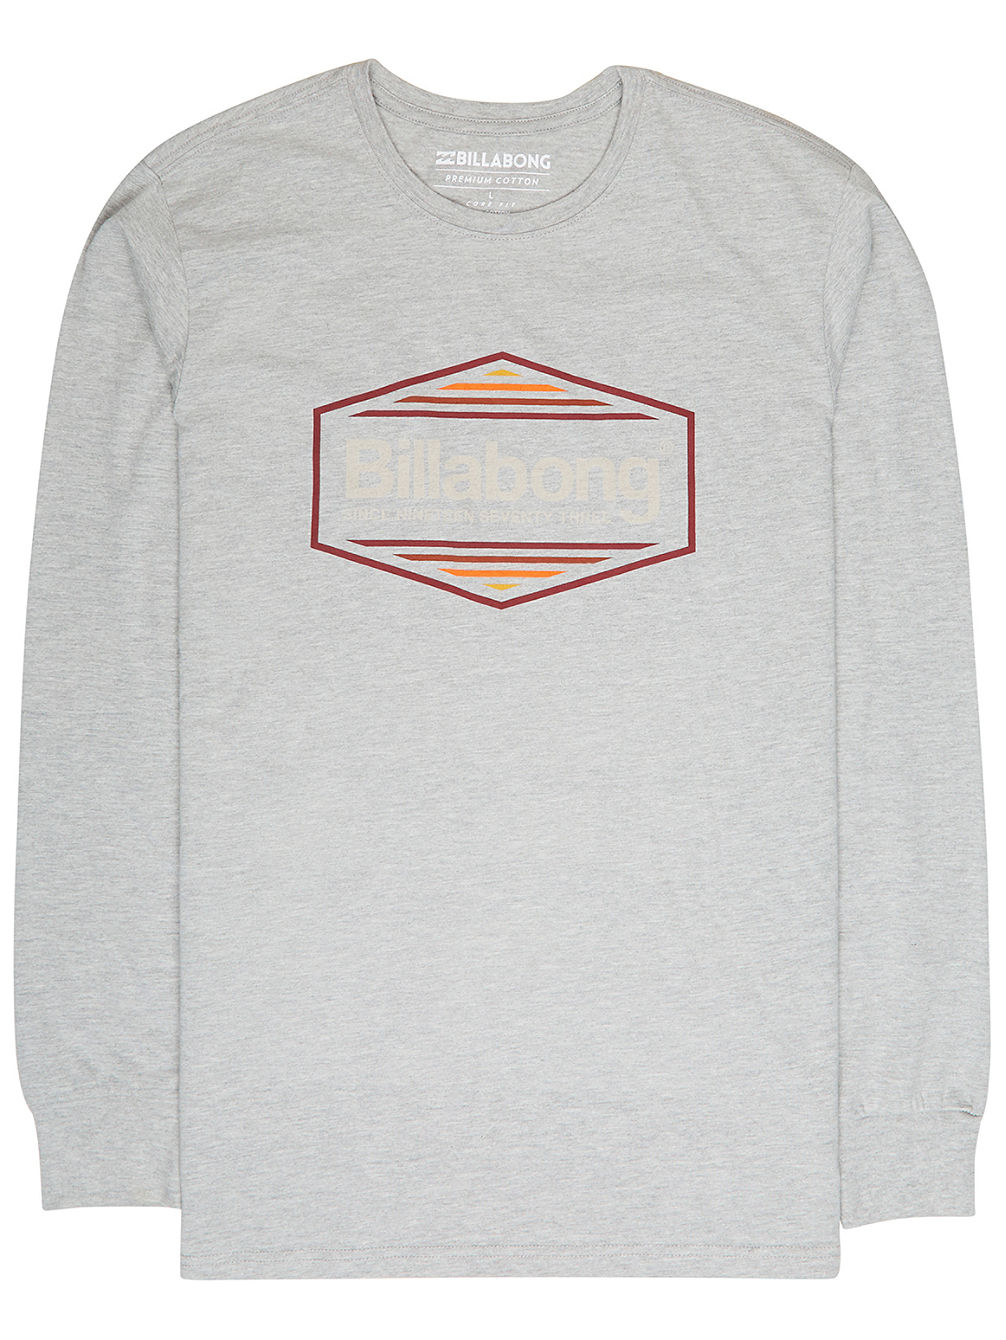 70d1388d Buy Billabong Pacific Long Sleeve T-Shirt online at Blue Tomato